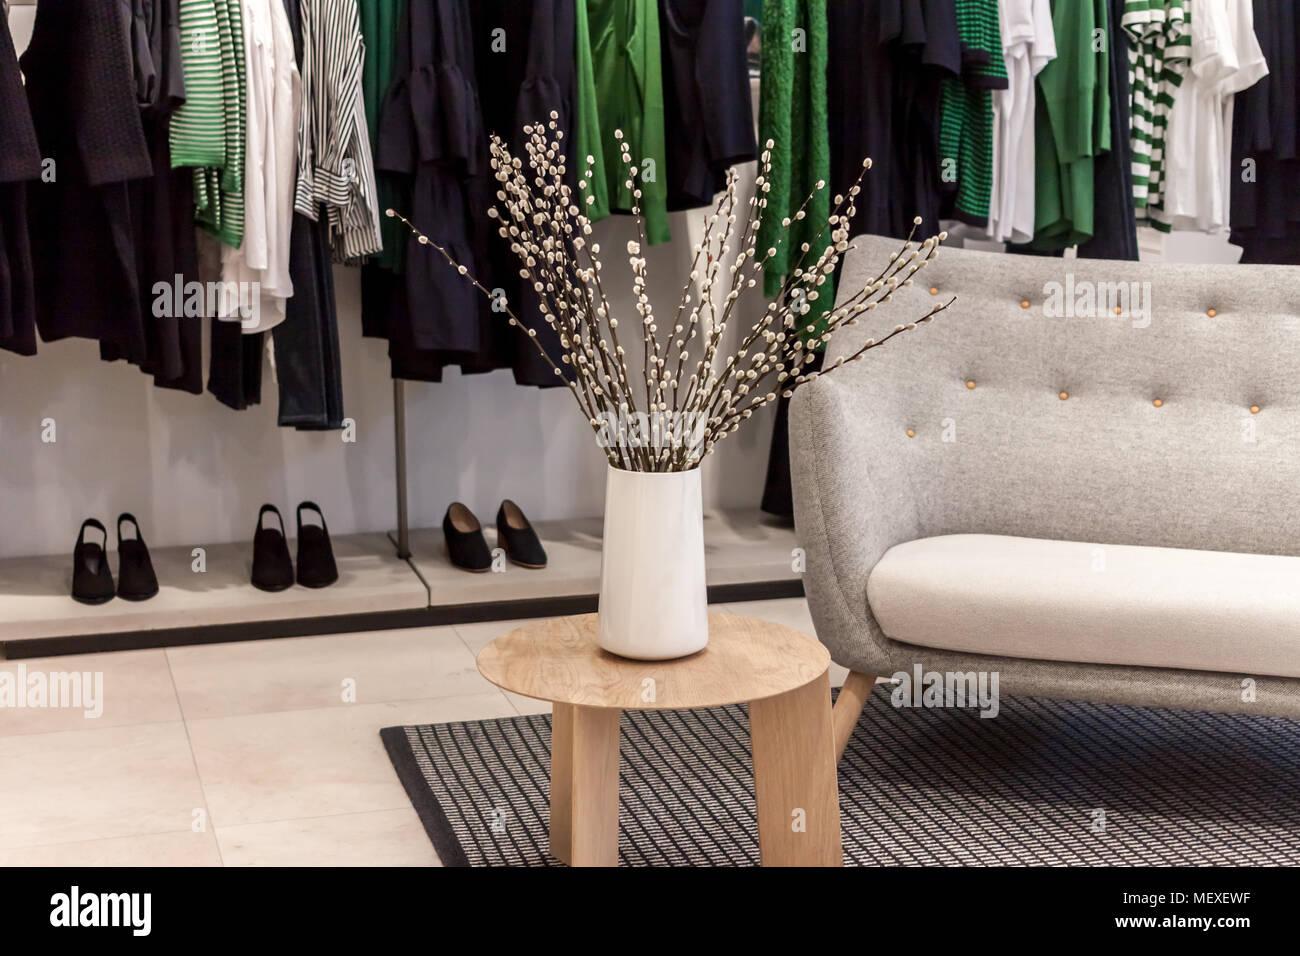 Shop Boutique Interior Decoration Vase With Flowers Stock Photo